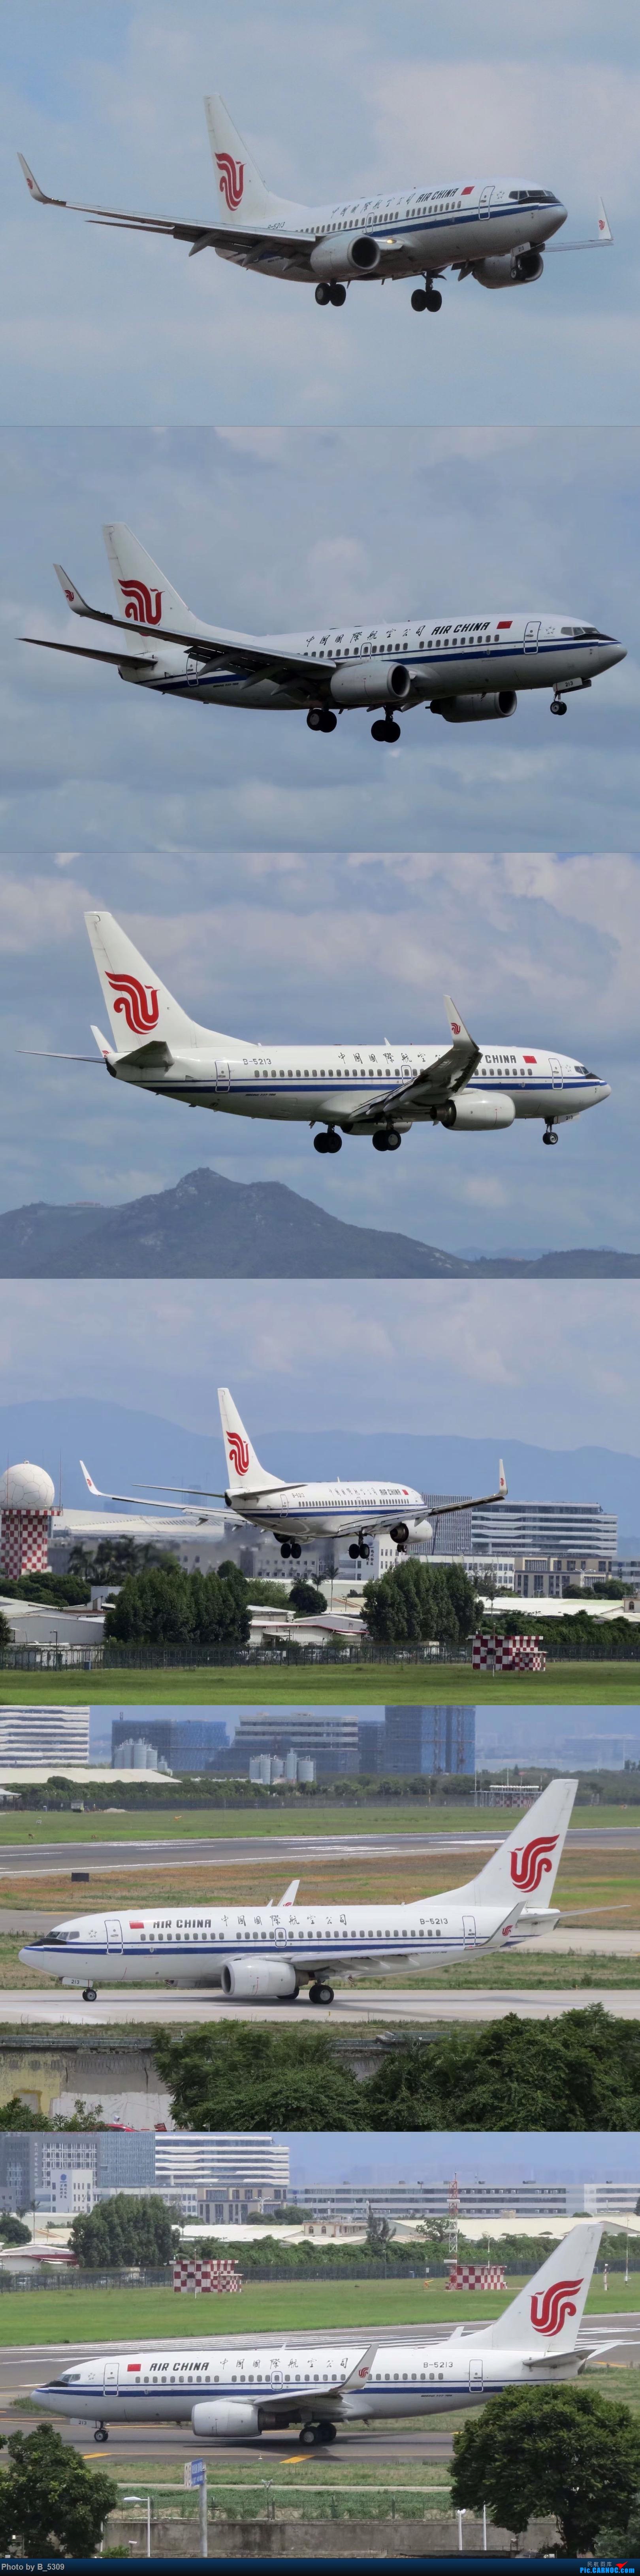 Re:[原创]白鹭窝终于换向了。。。 BOEING 737-700 B-5213 中国厦门高崎国际机场